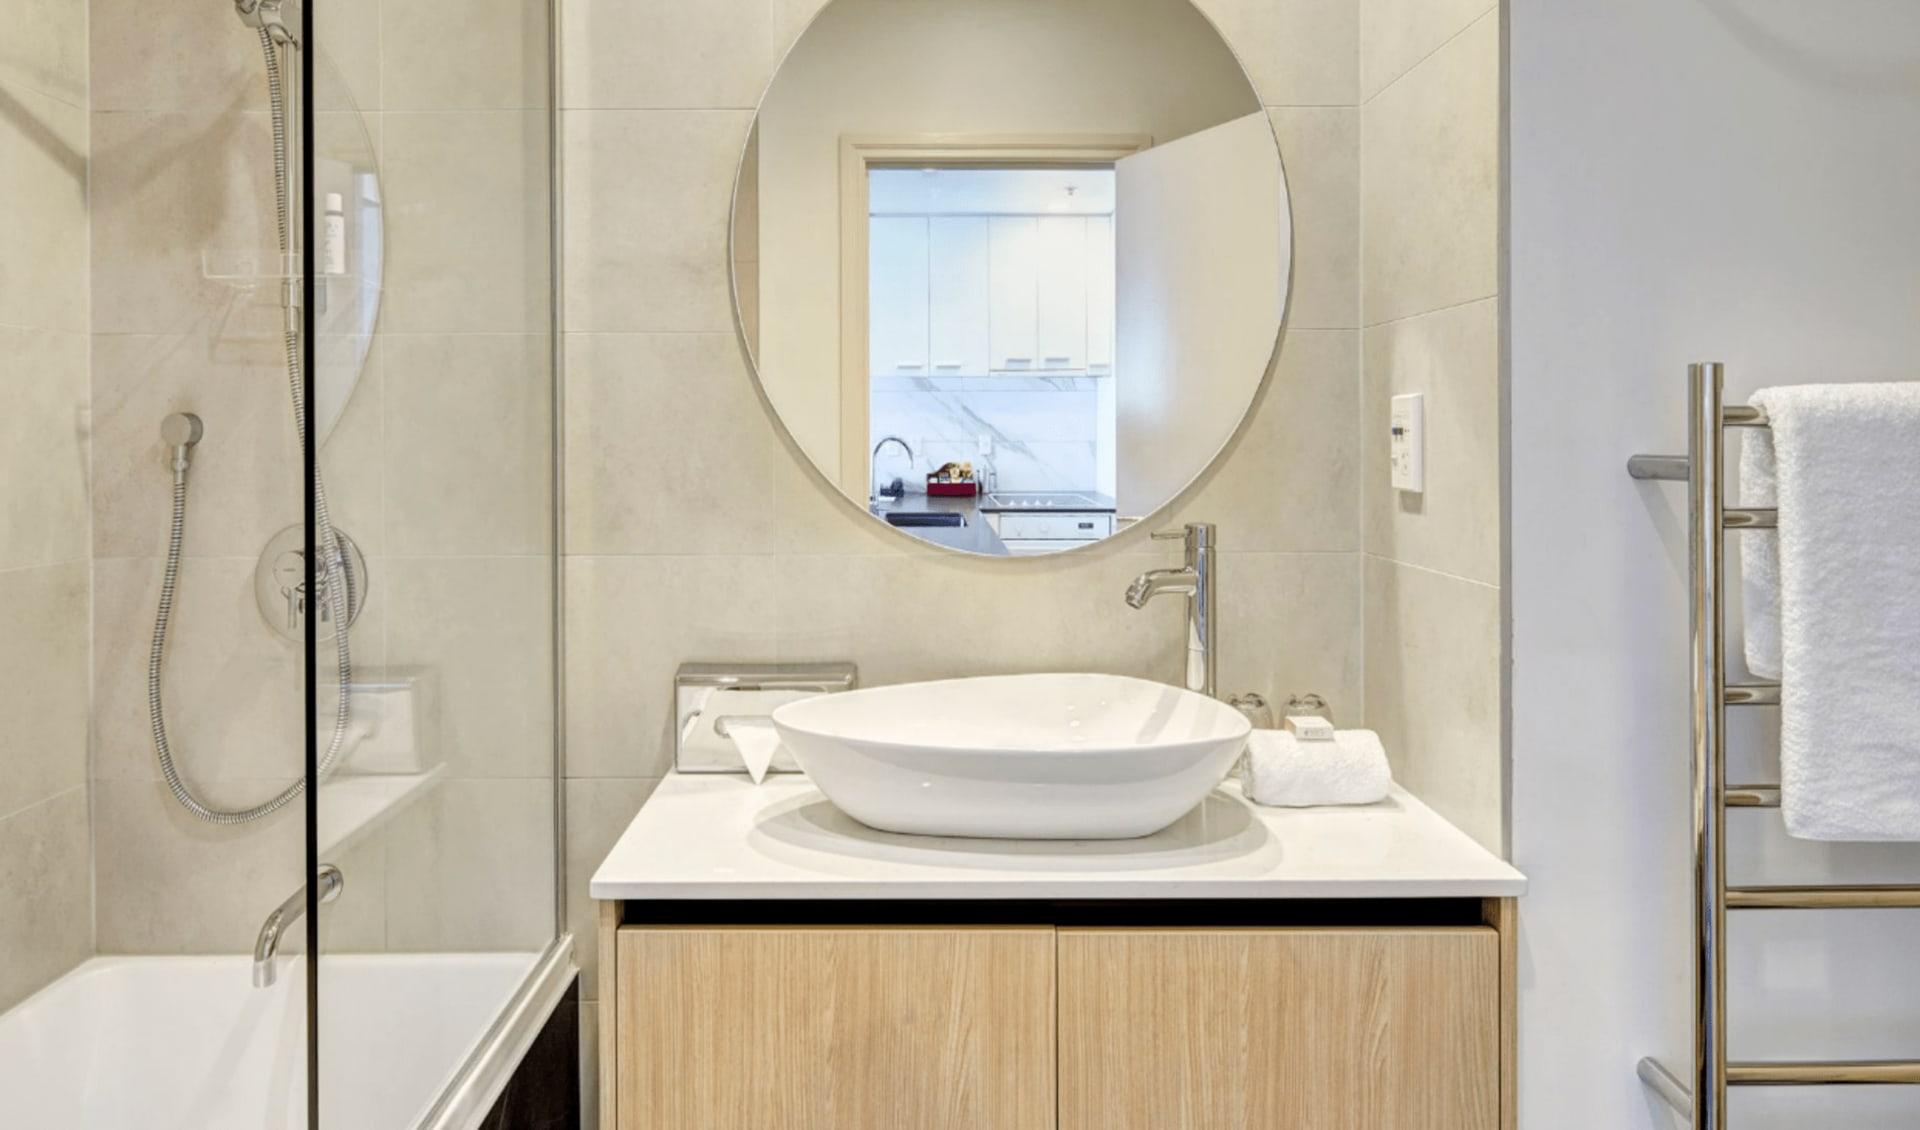 CityLife Auckland: CityLife 2 bedroom bath